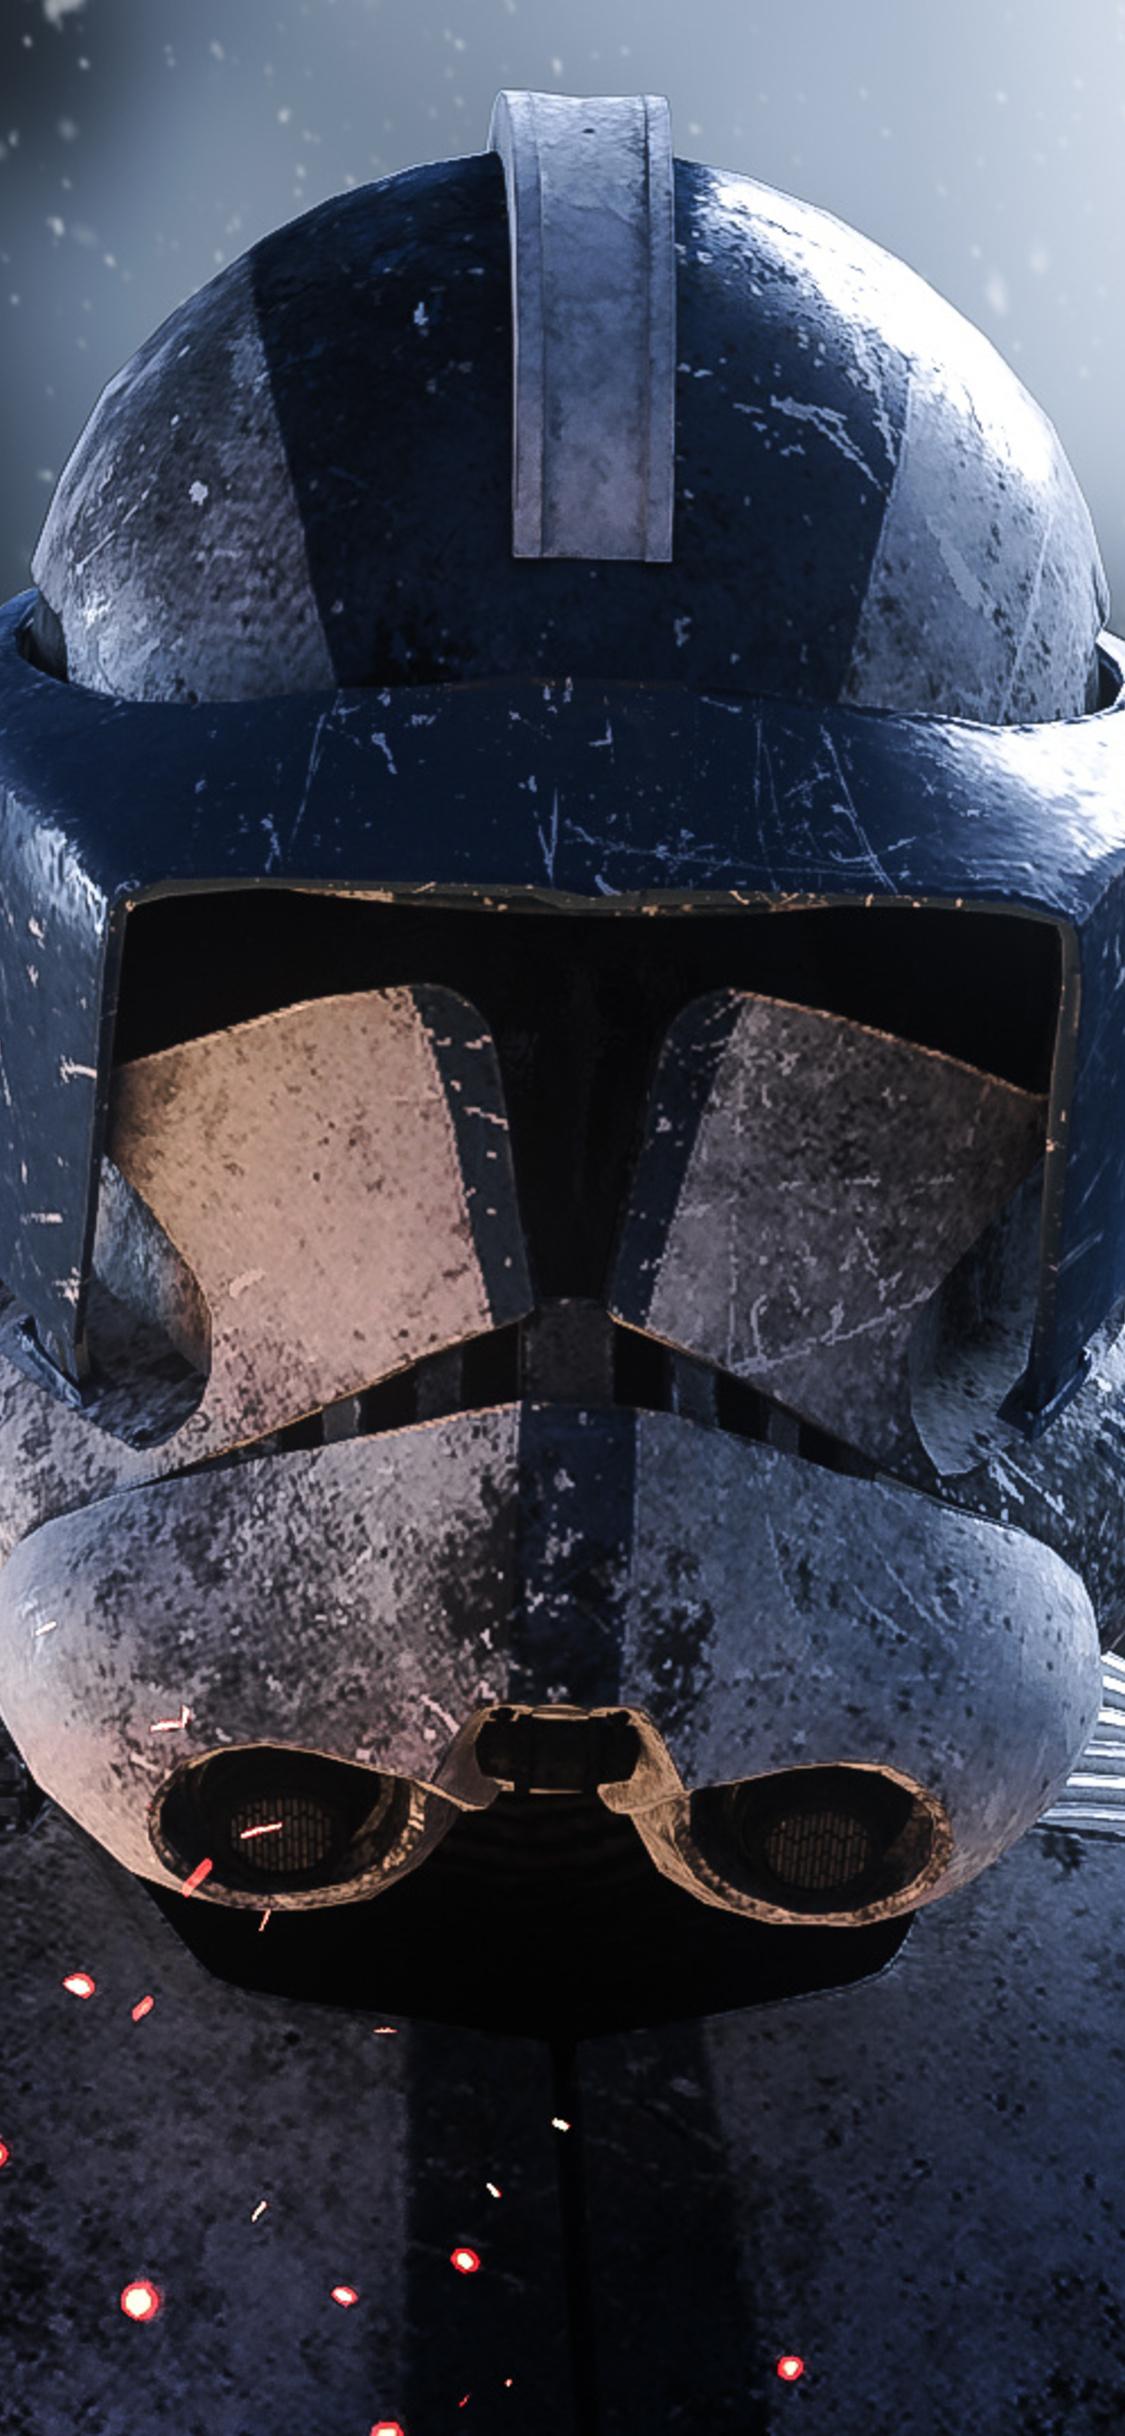 1125x2436 Clone Trooper Star Wars 2018 Iphone Xs Iphone 10 Iphone